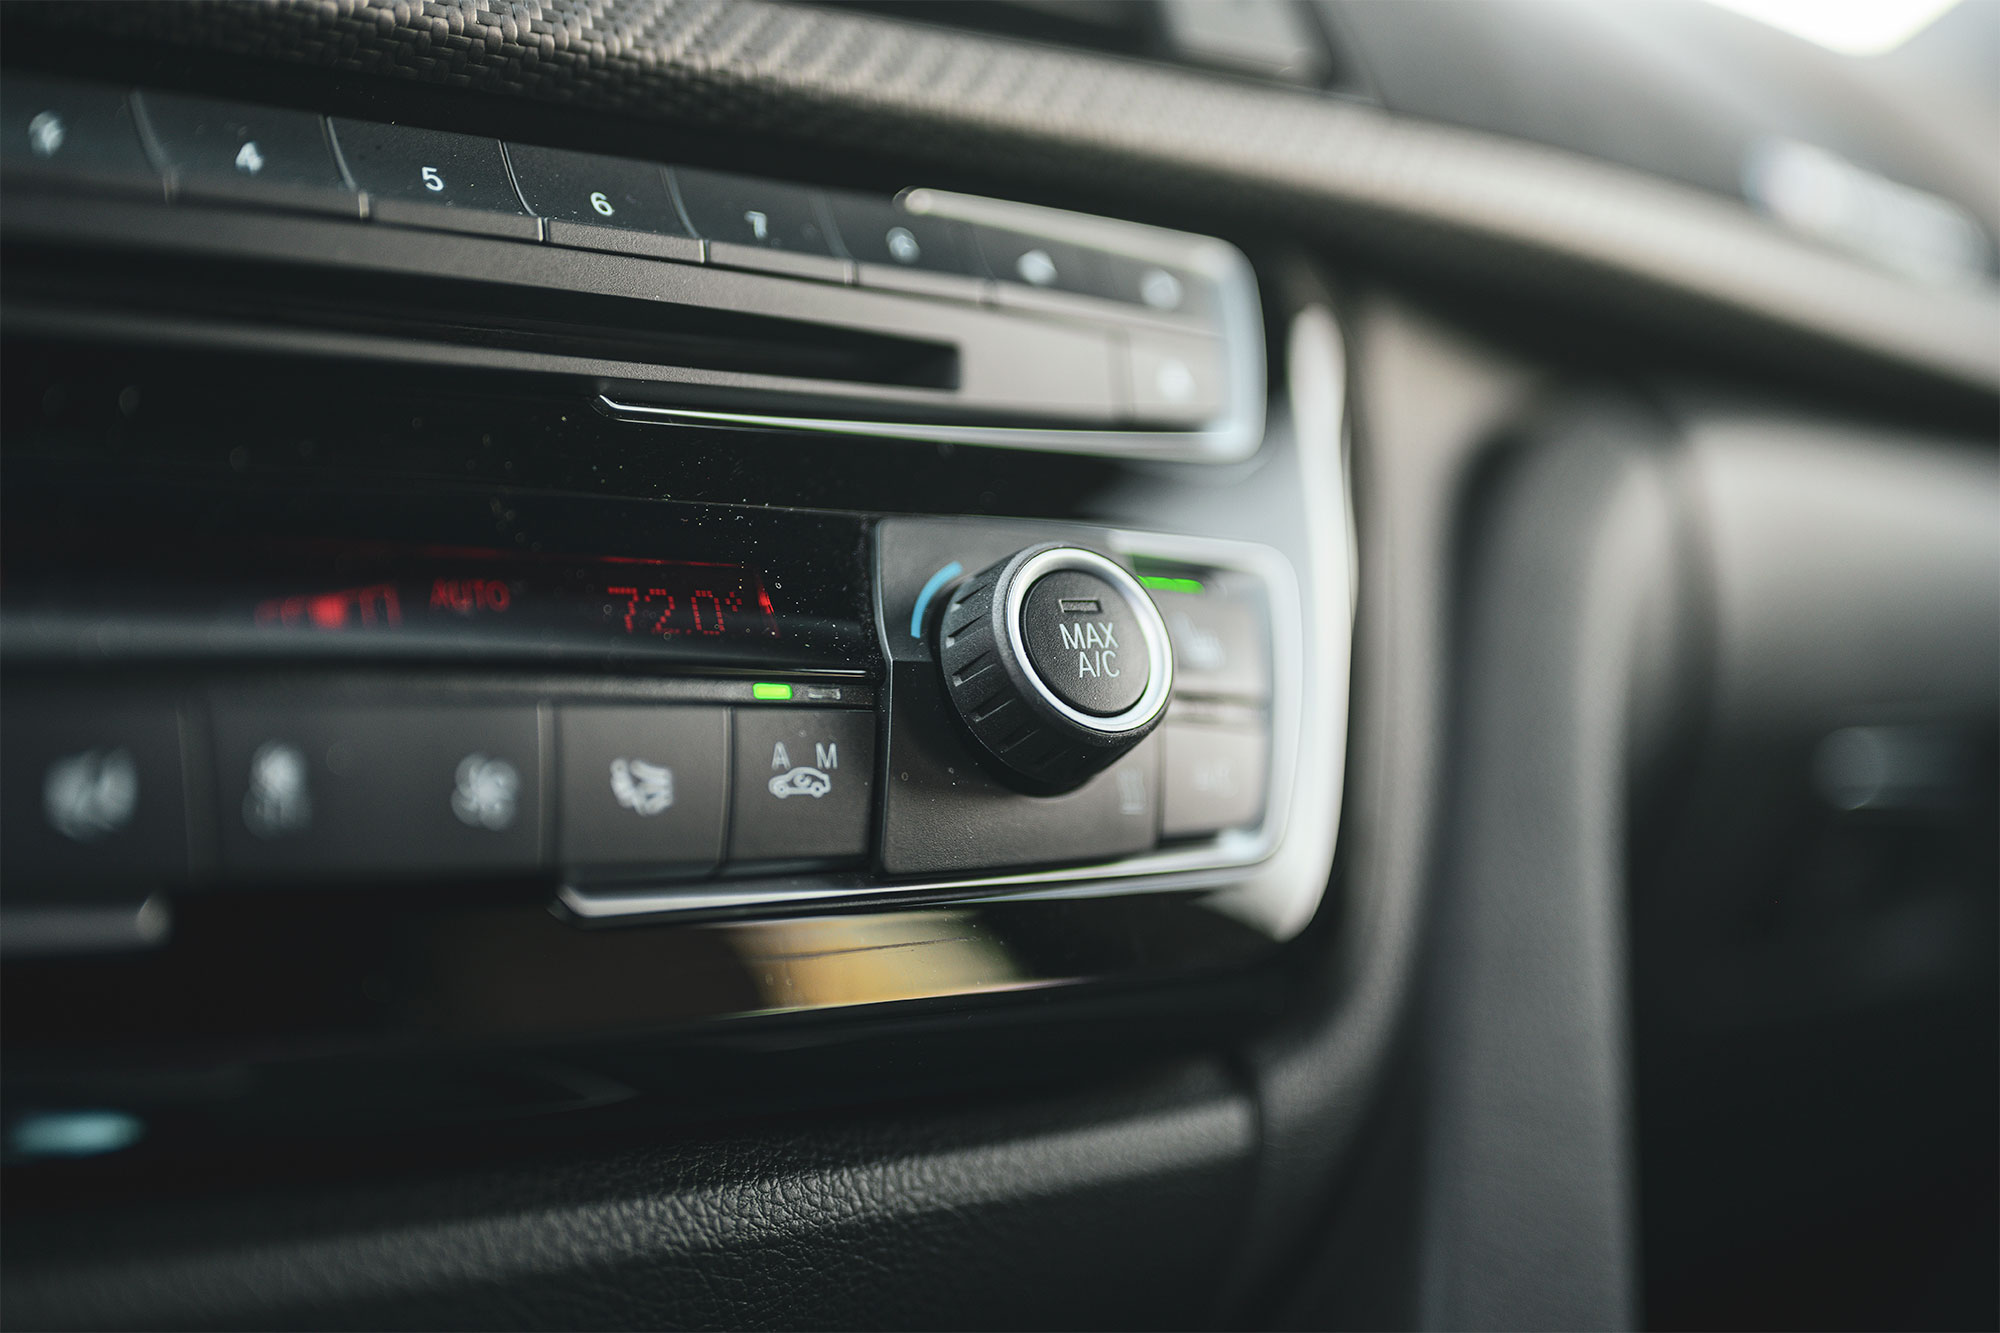 BMW 335i Climate Control